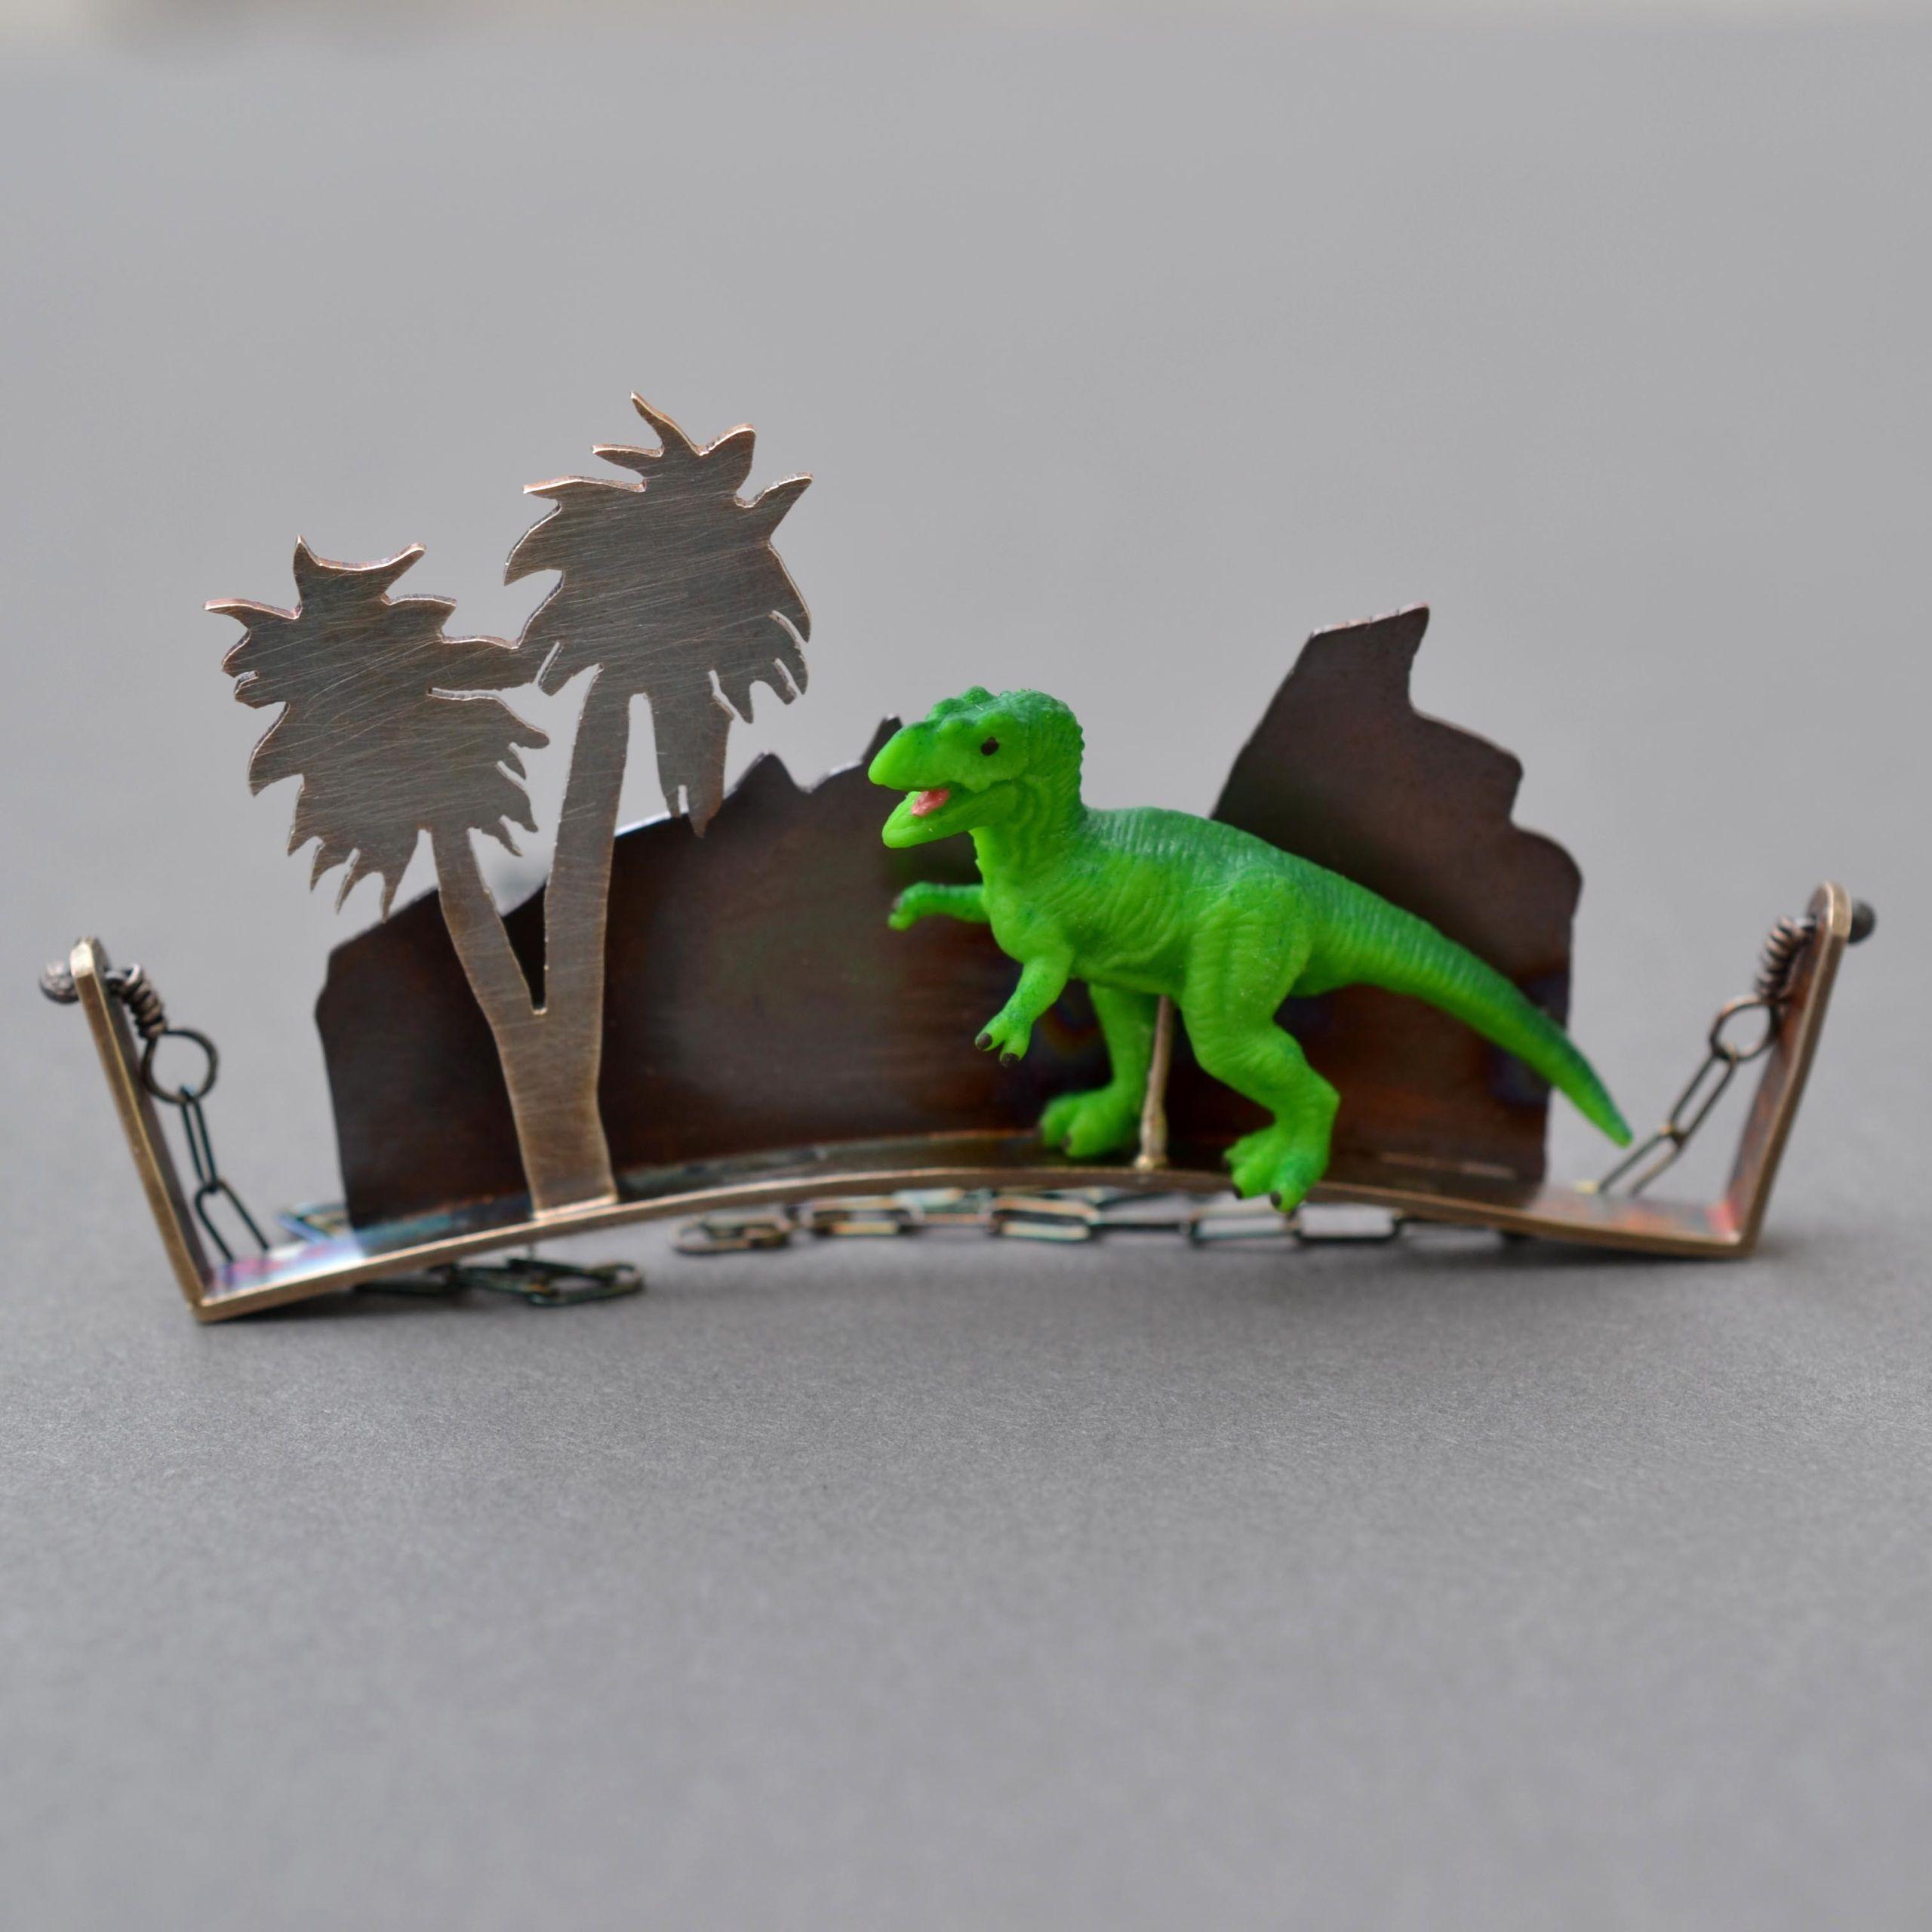 T Rex Diorama Necklace - Metamorphosis Metals